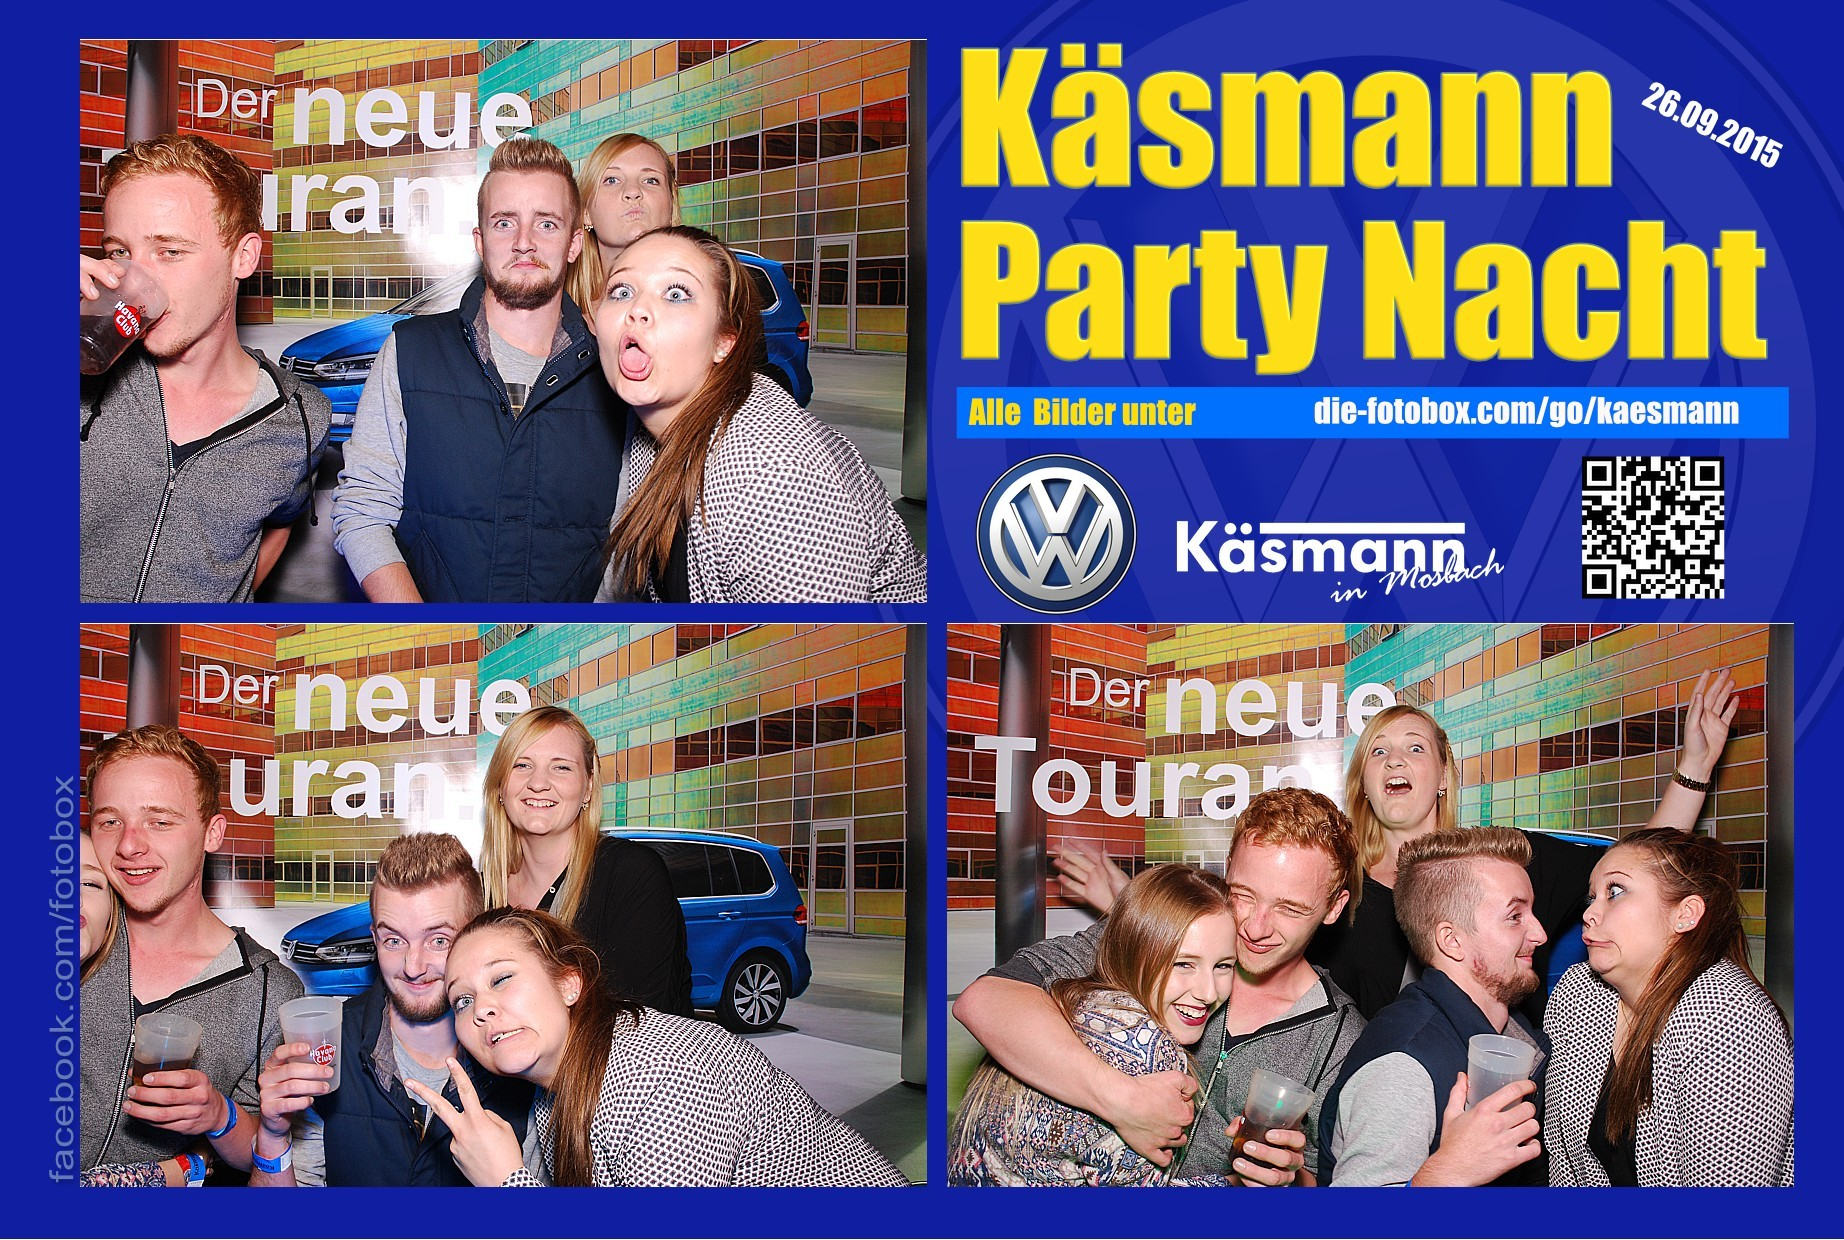 Käsmannparty 2015 - www.die-fotobox.com 01393